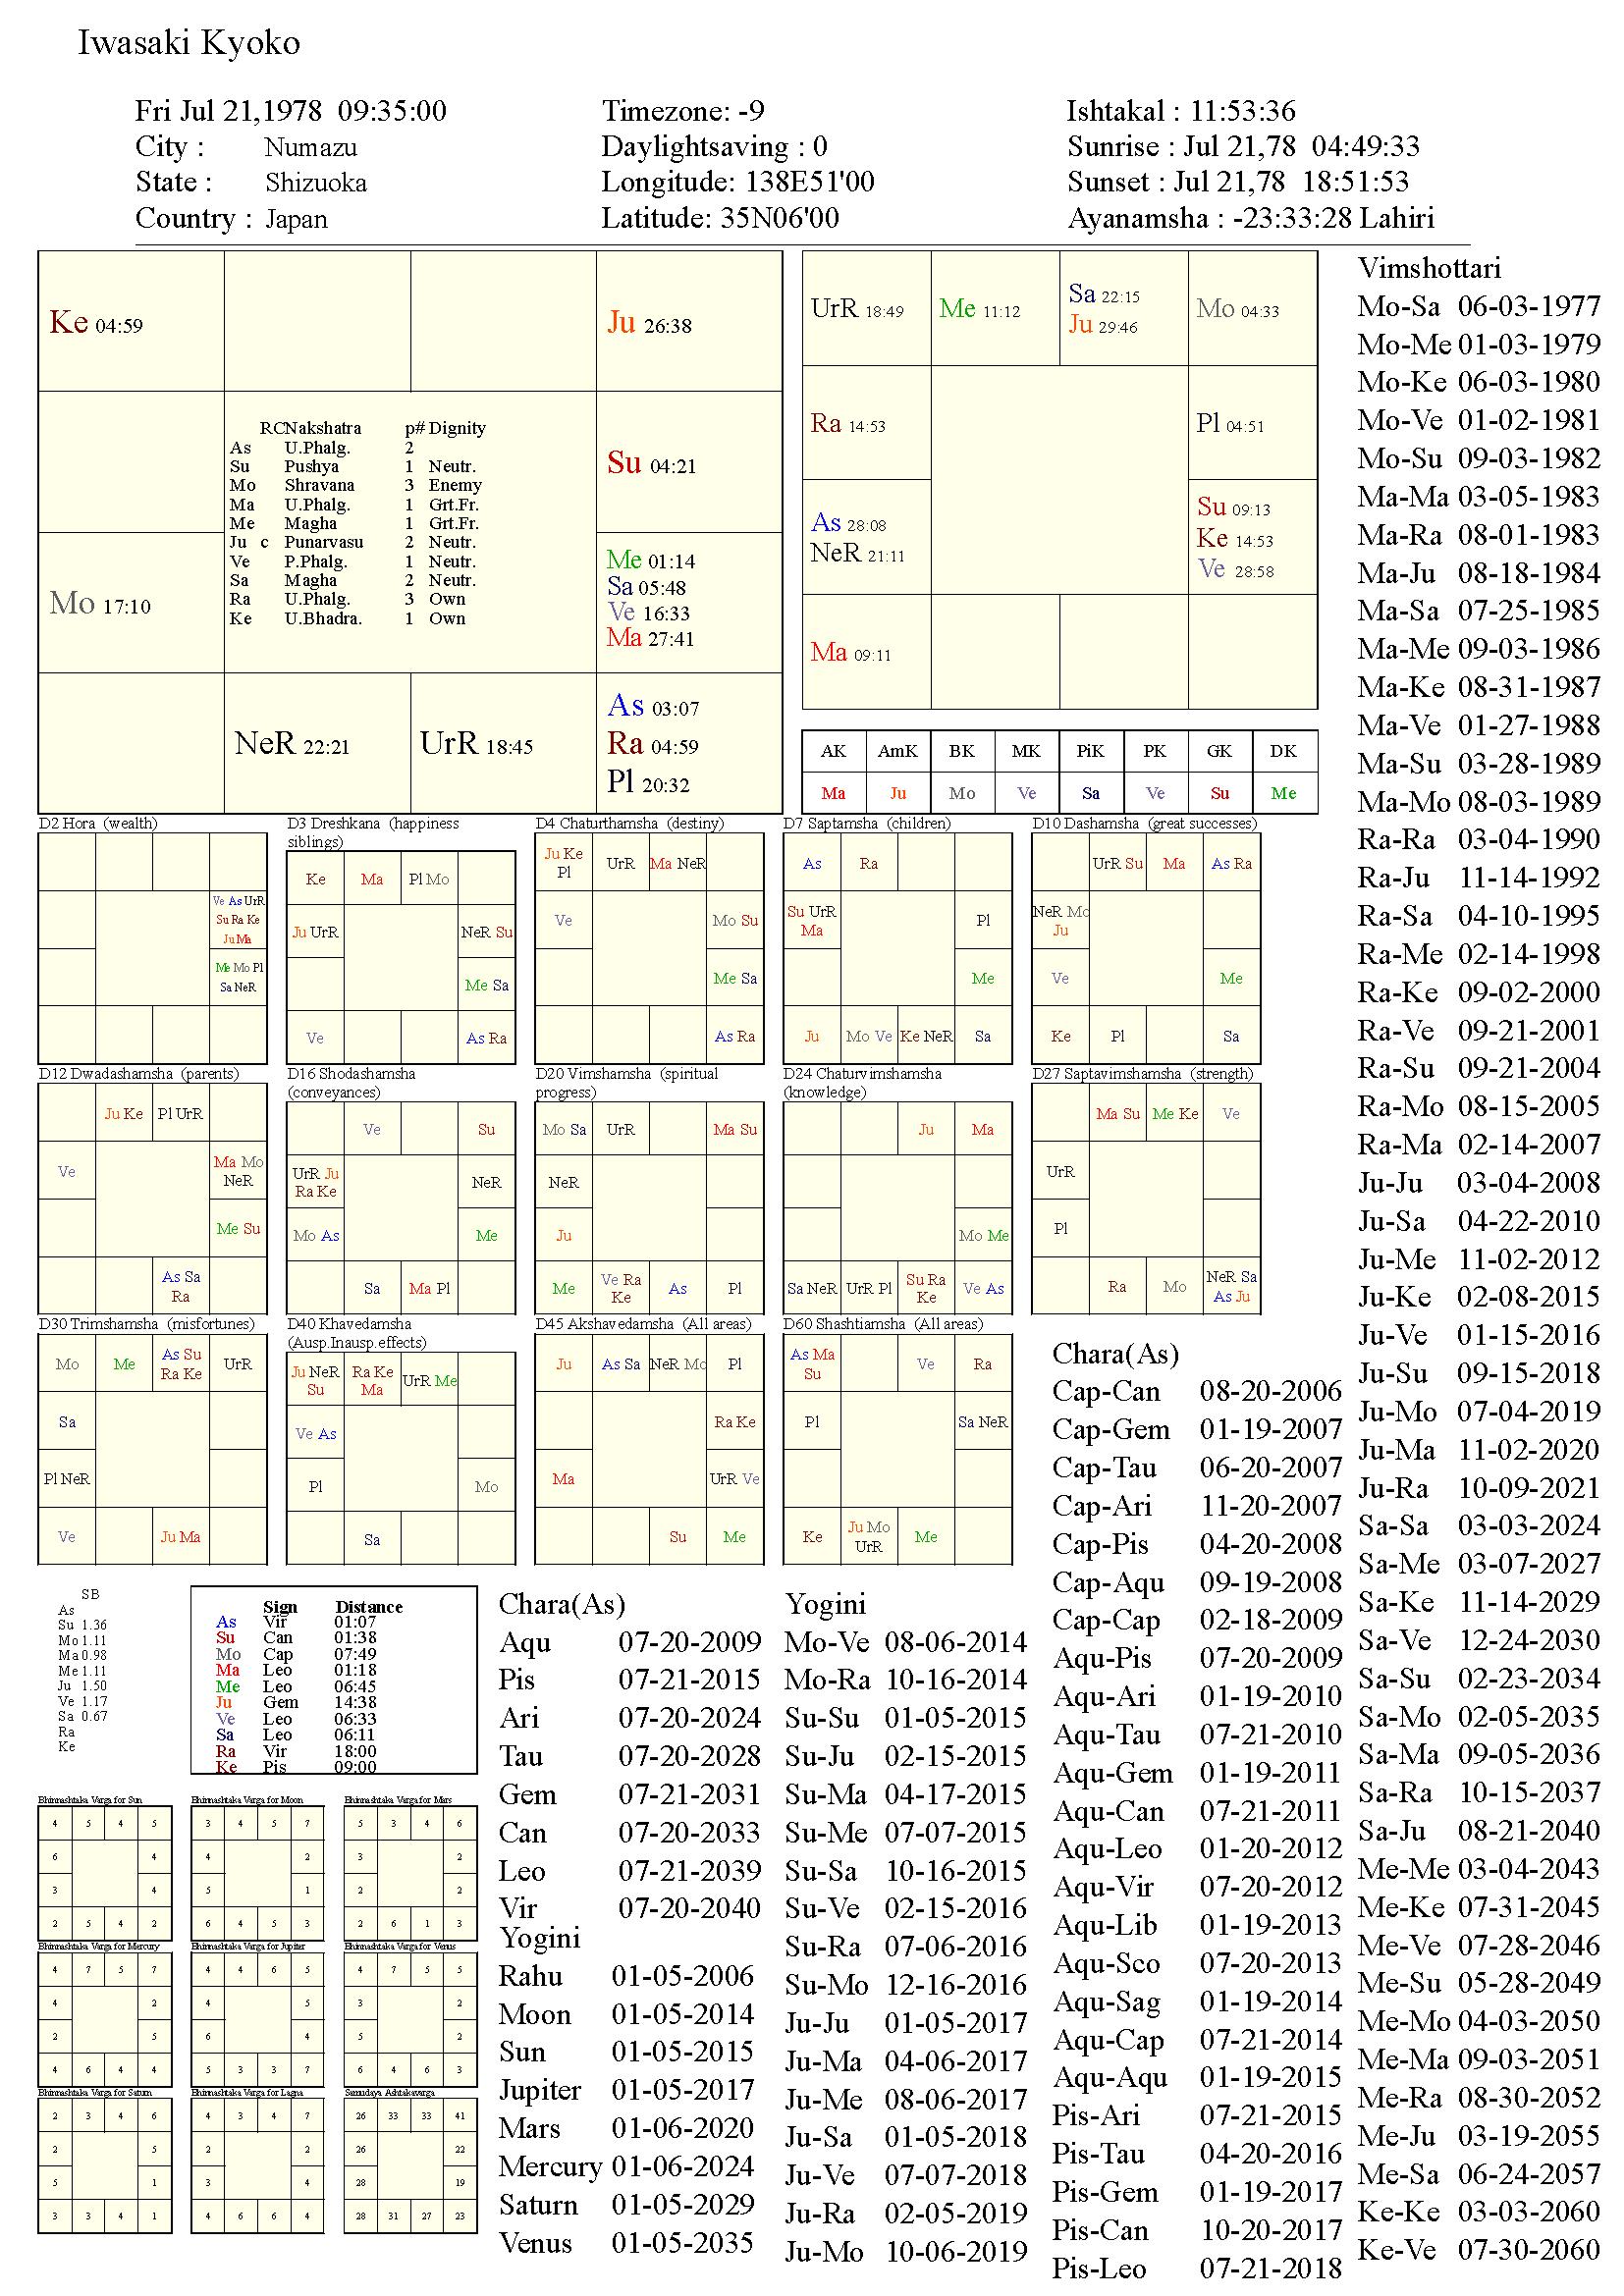 iwasakikyoko_chart